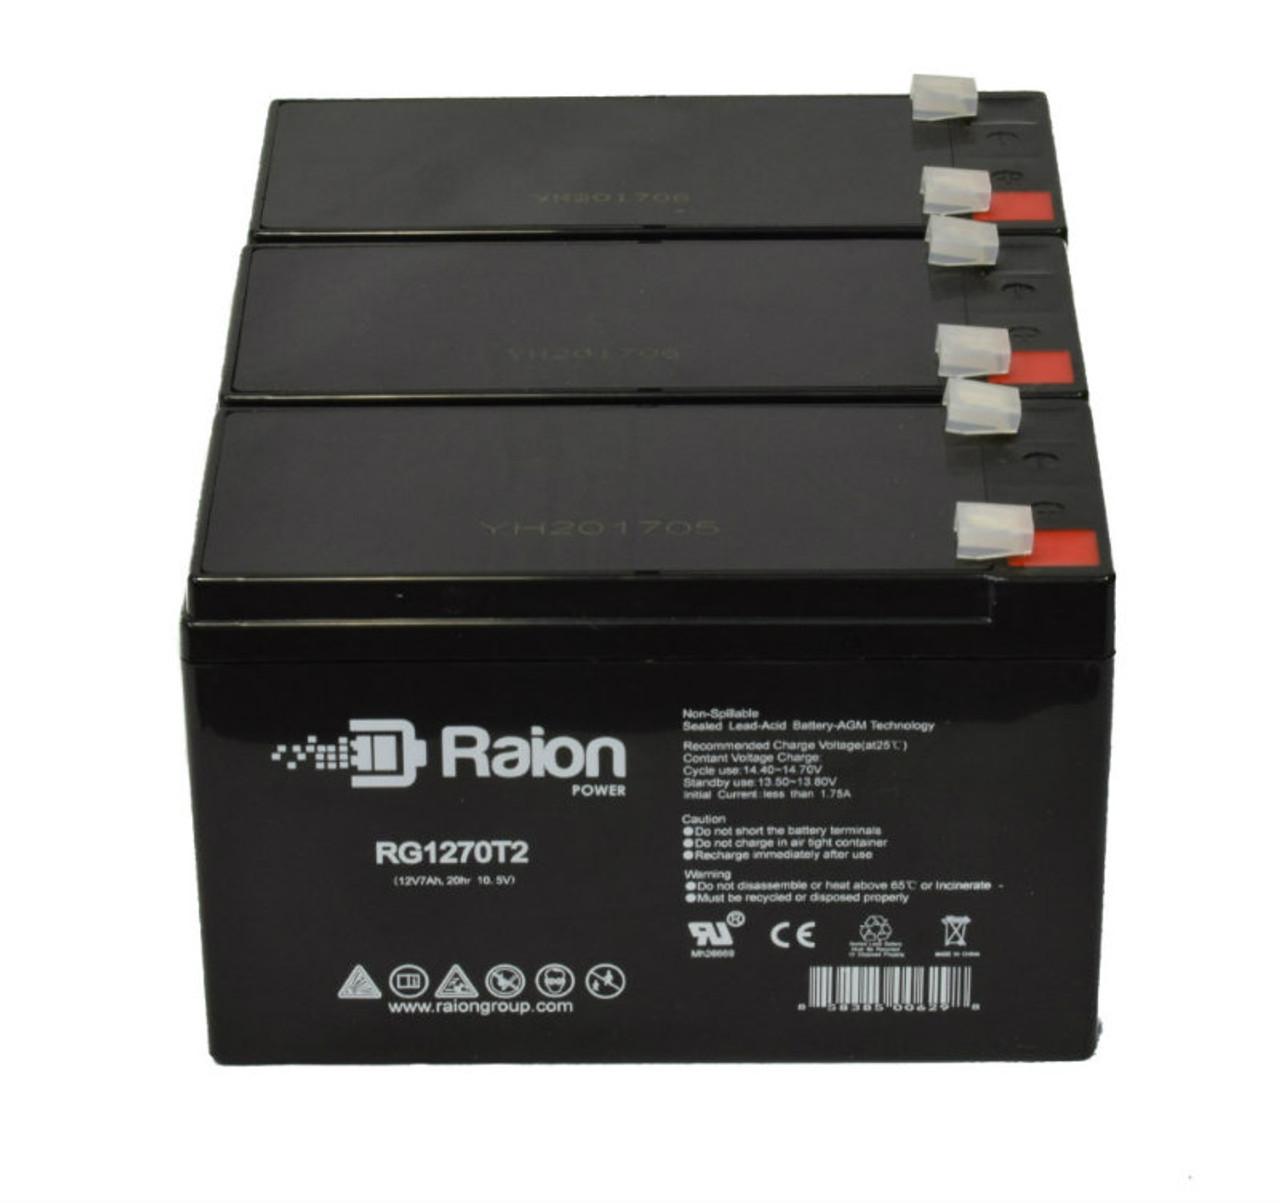 Raion Power RG1270T2 Replacement Set Battery For Tripp Lite SUA1400net 8ah (3 Pack)